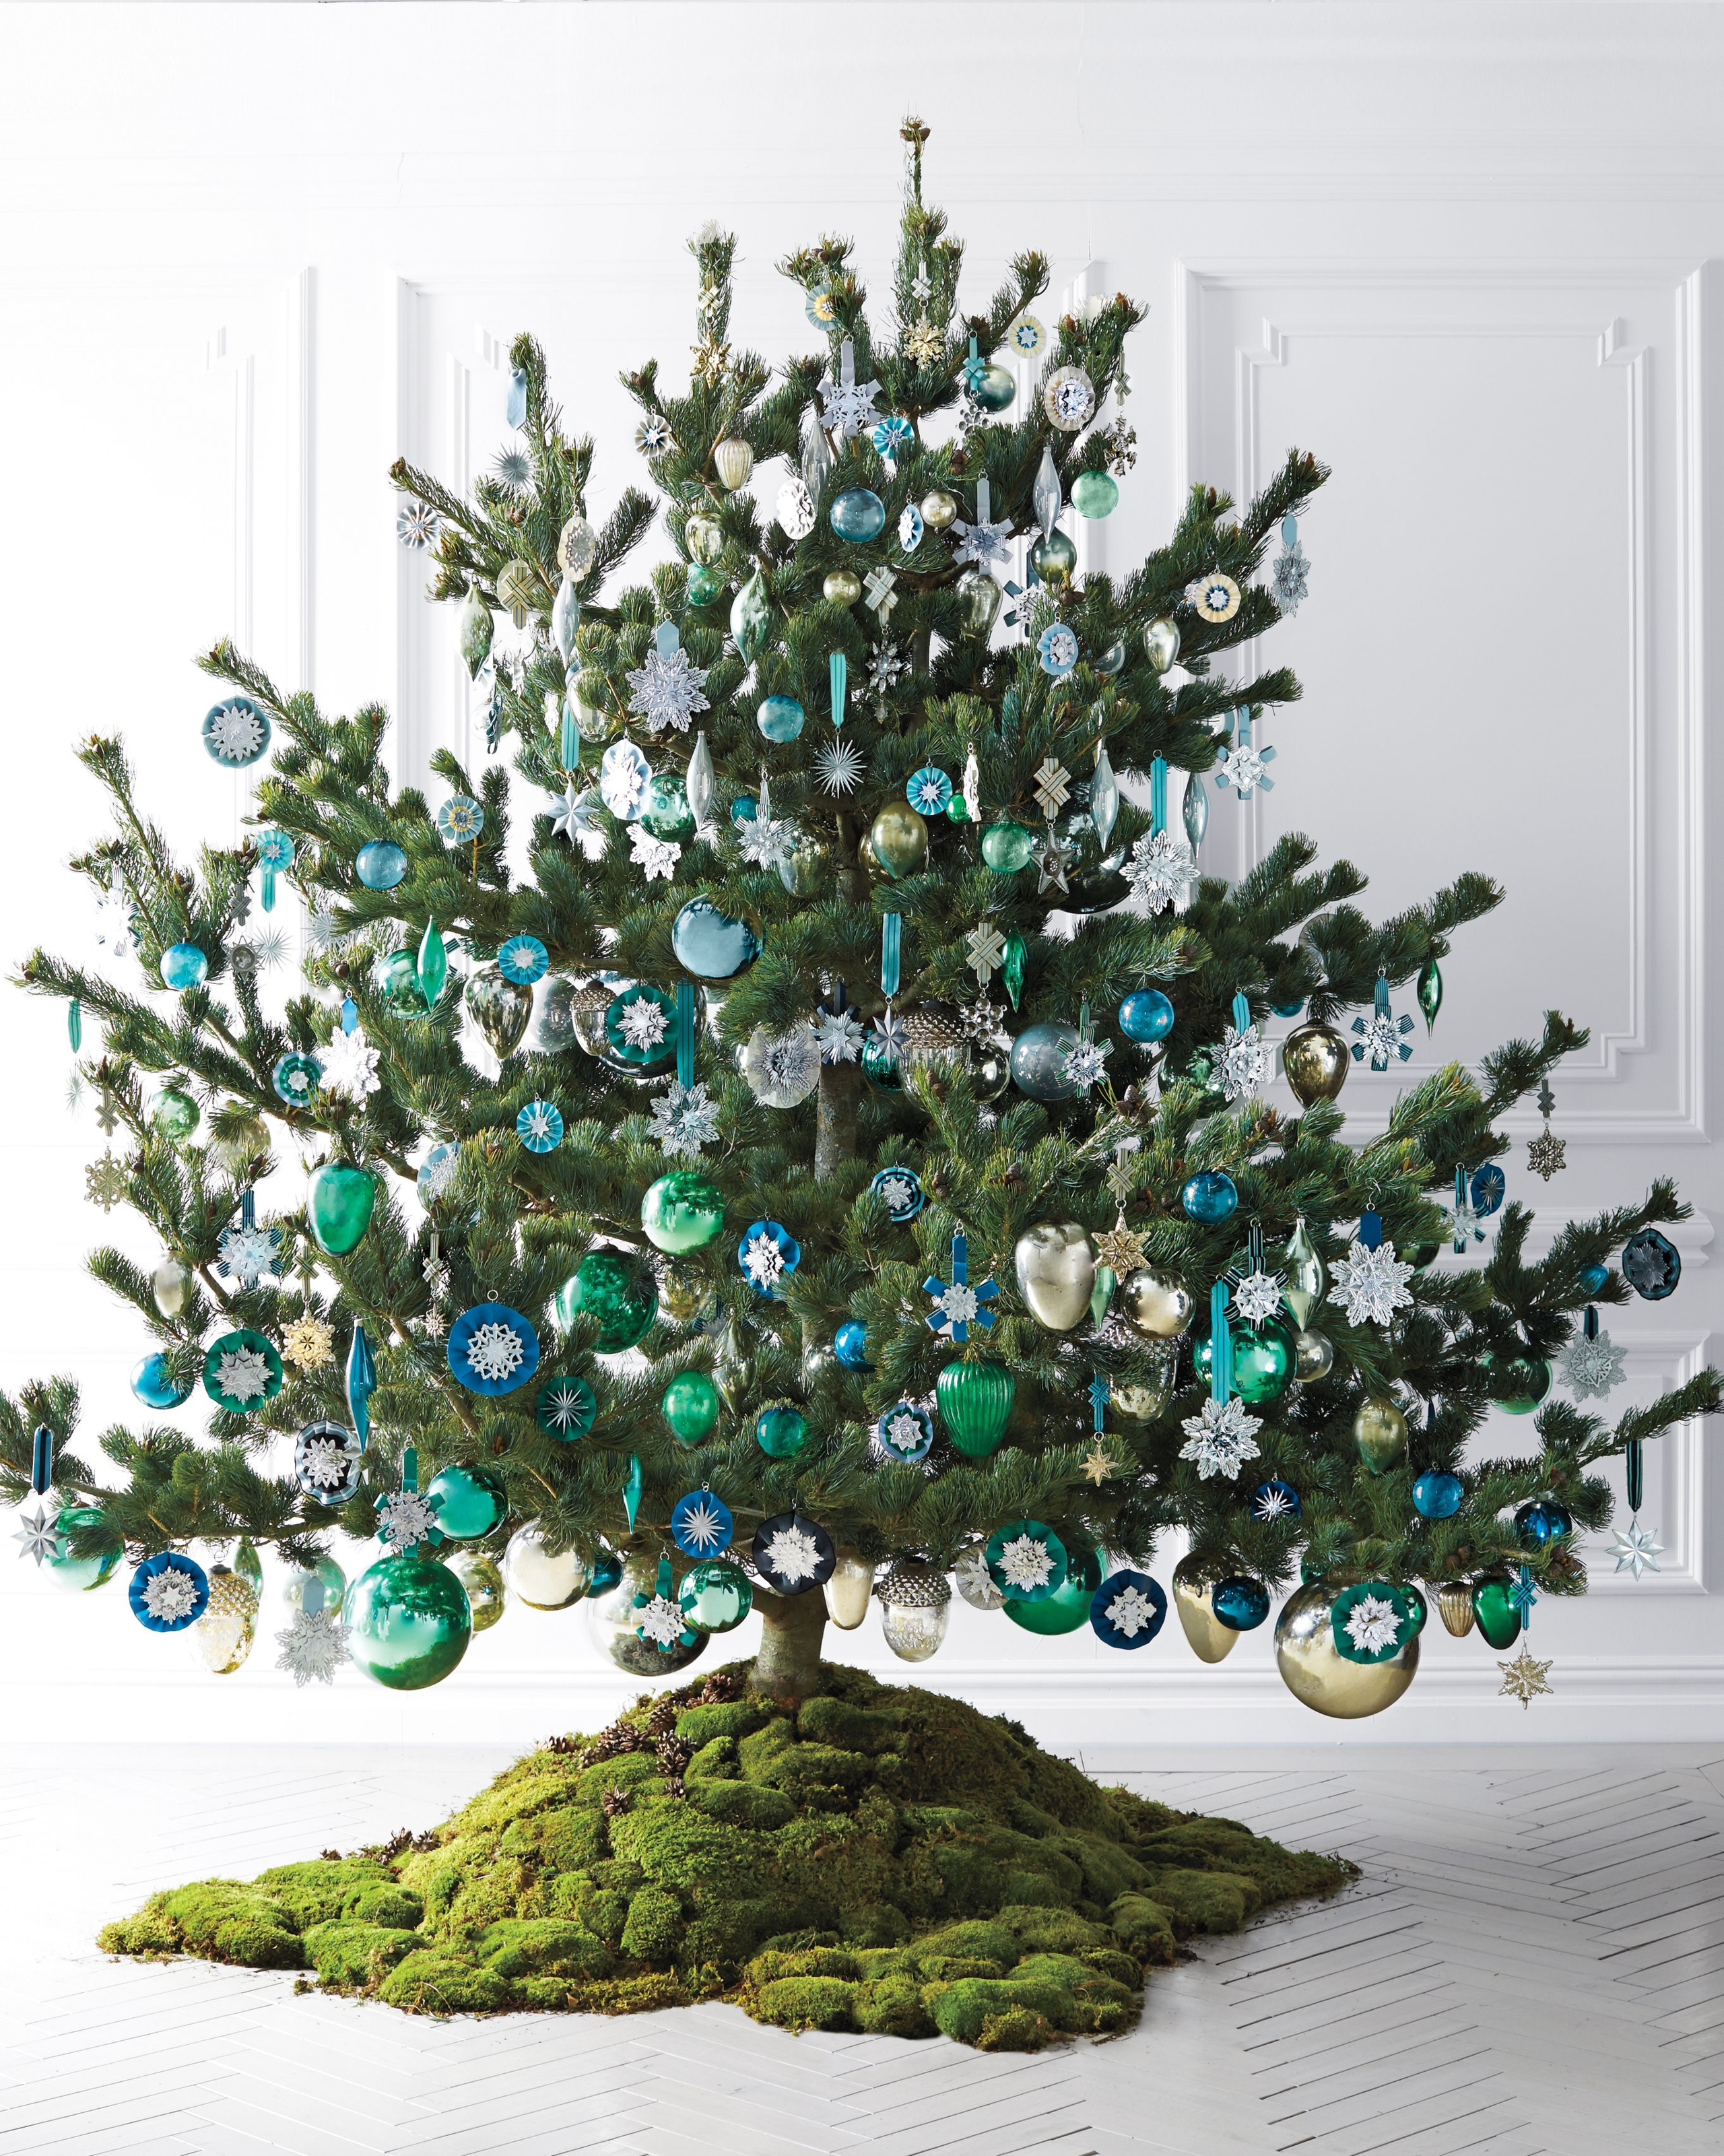 Martha Stewart Christmas Decorations To Make  from visualhunt.com